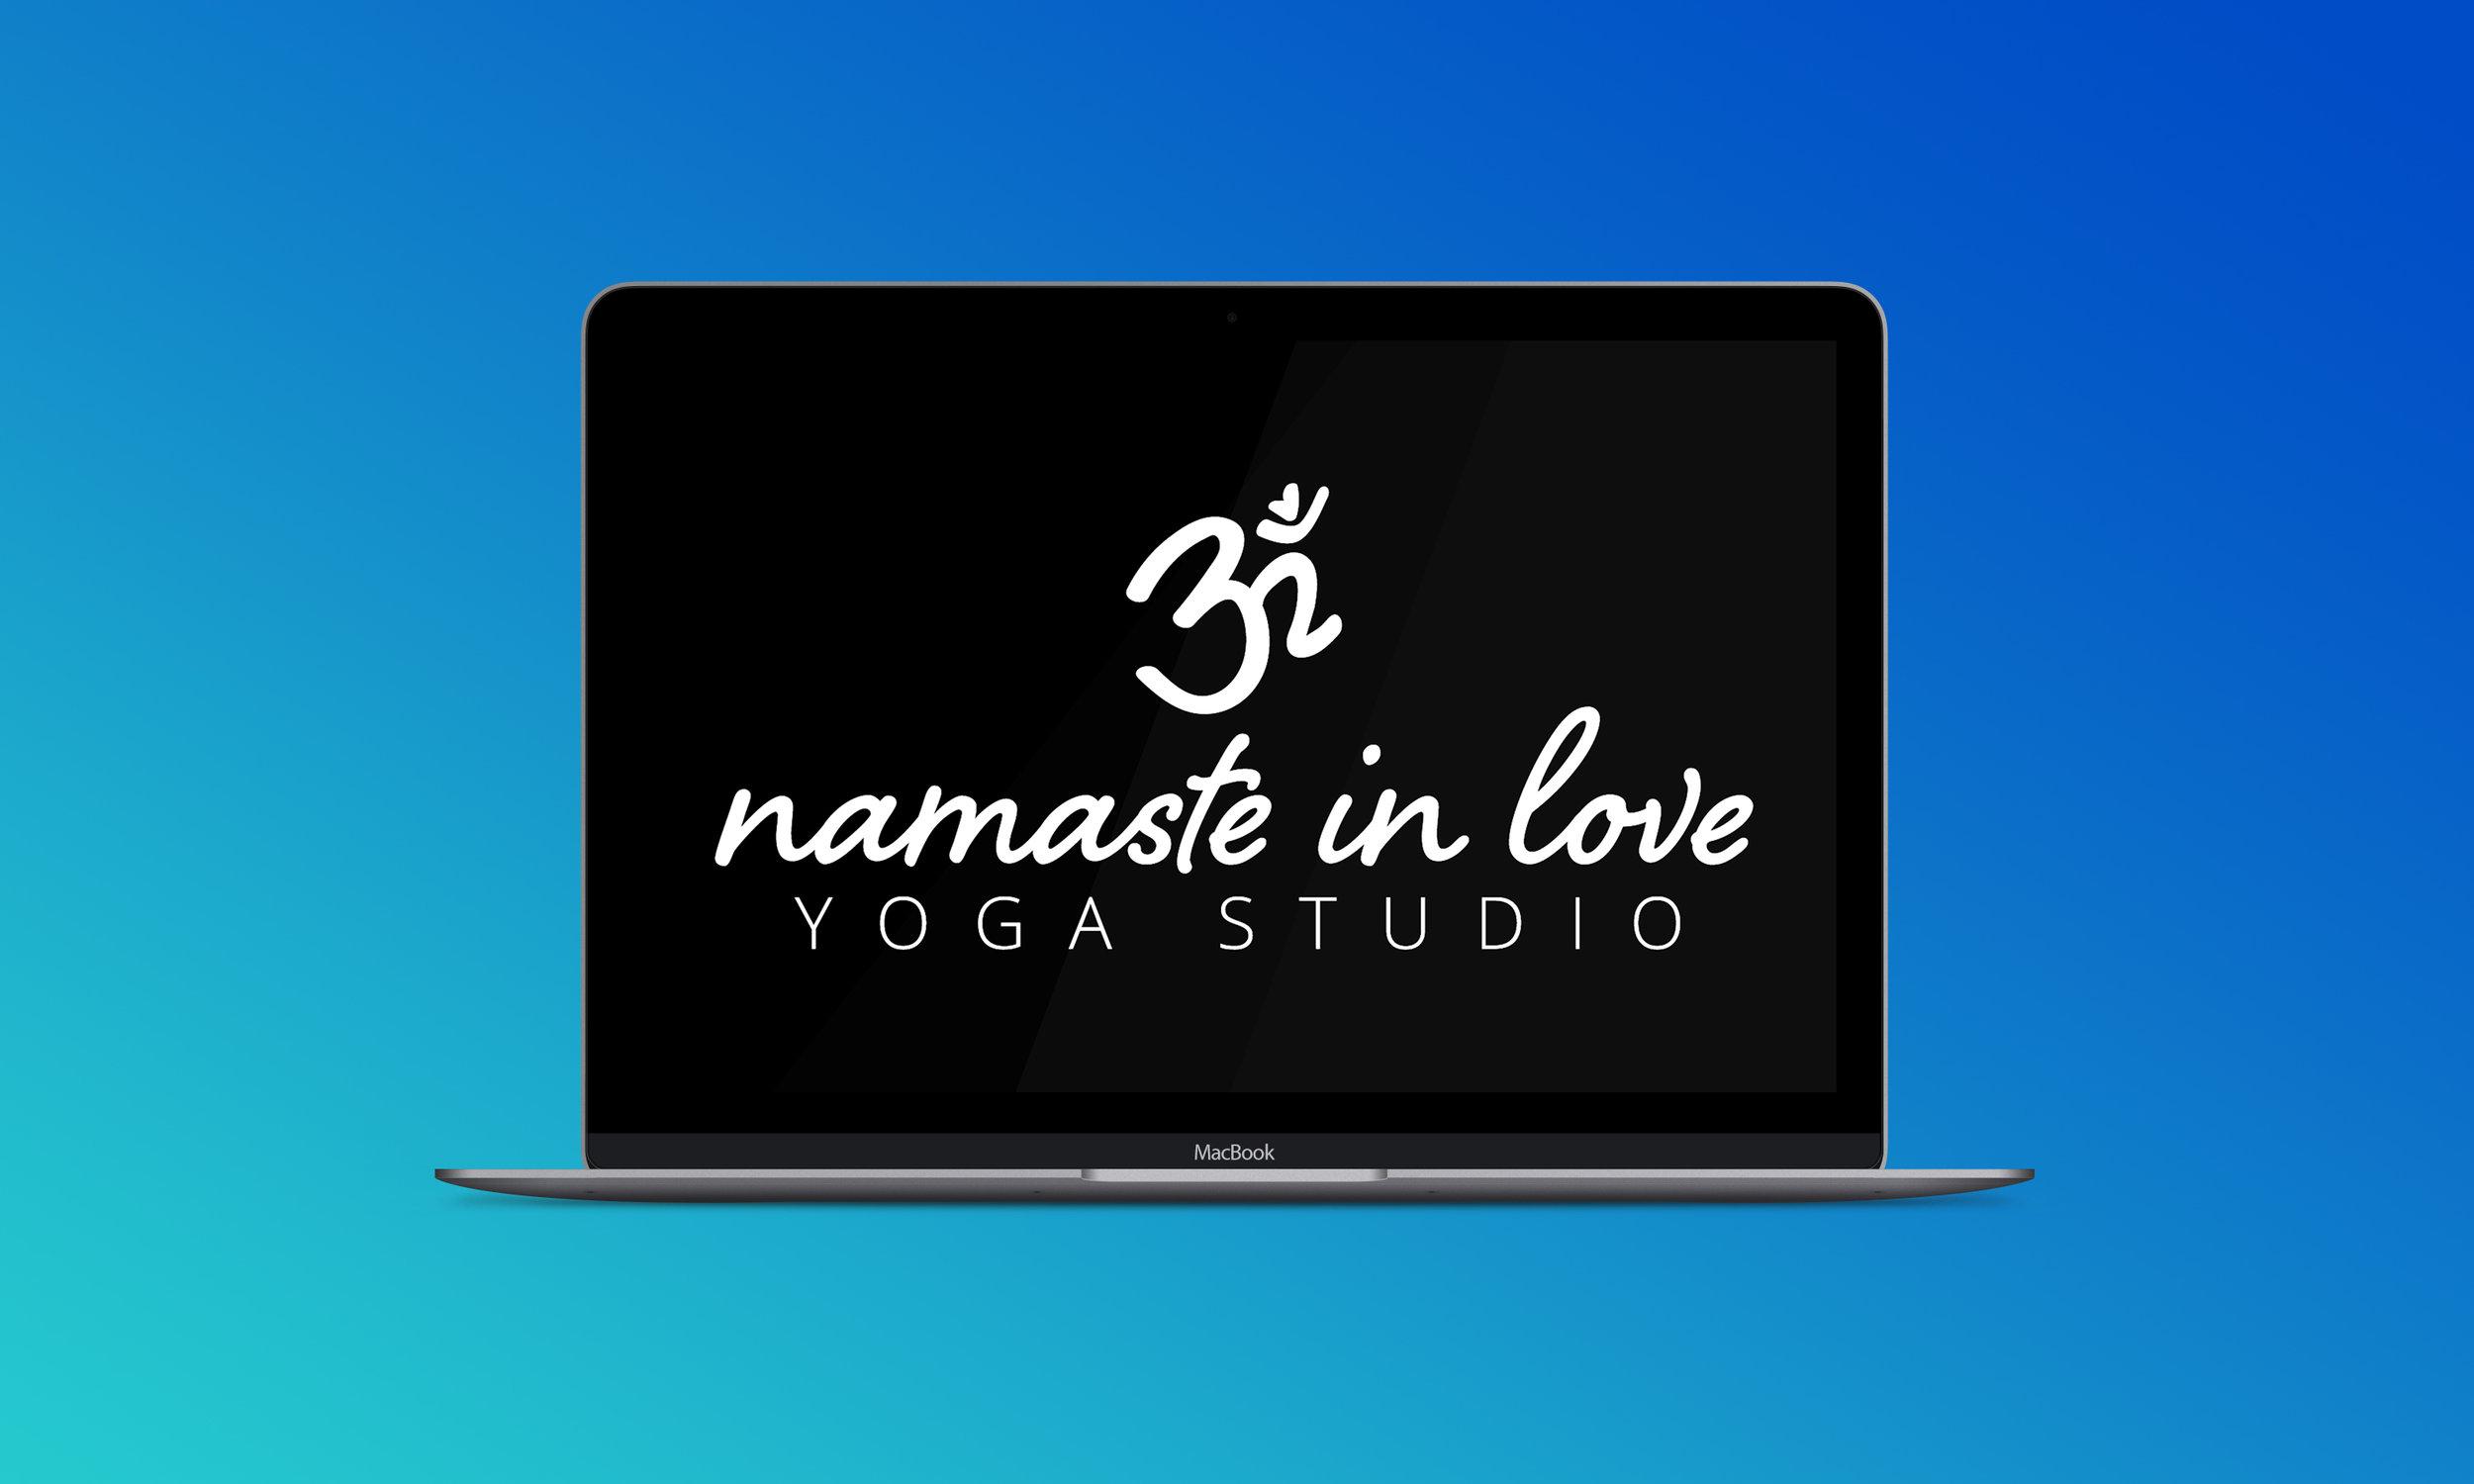 yoga-studio-logo-design